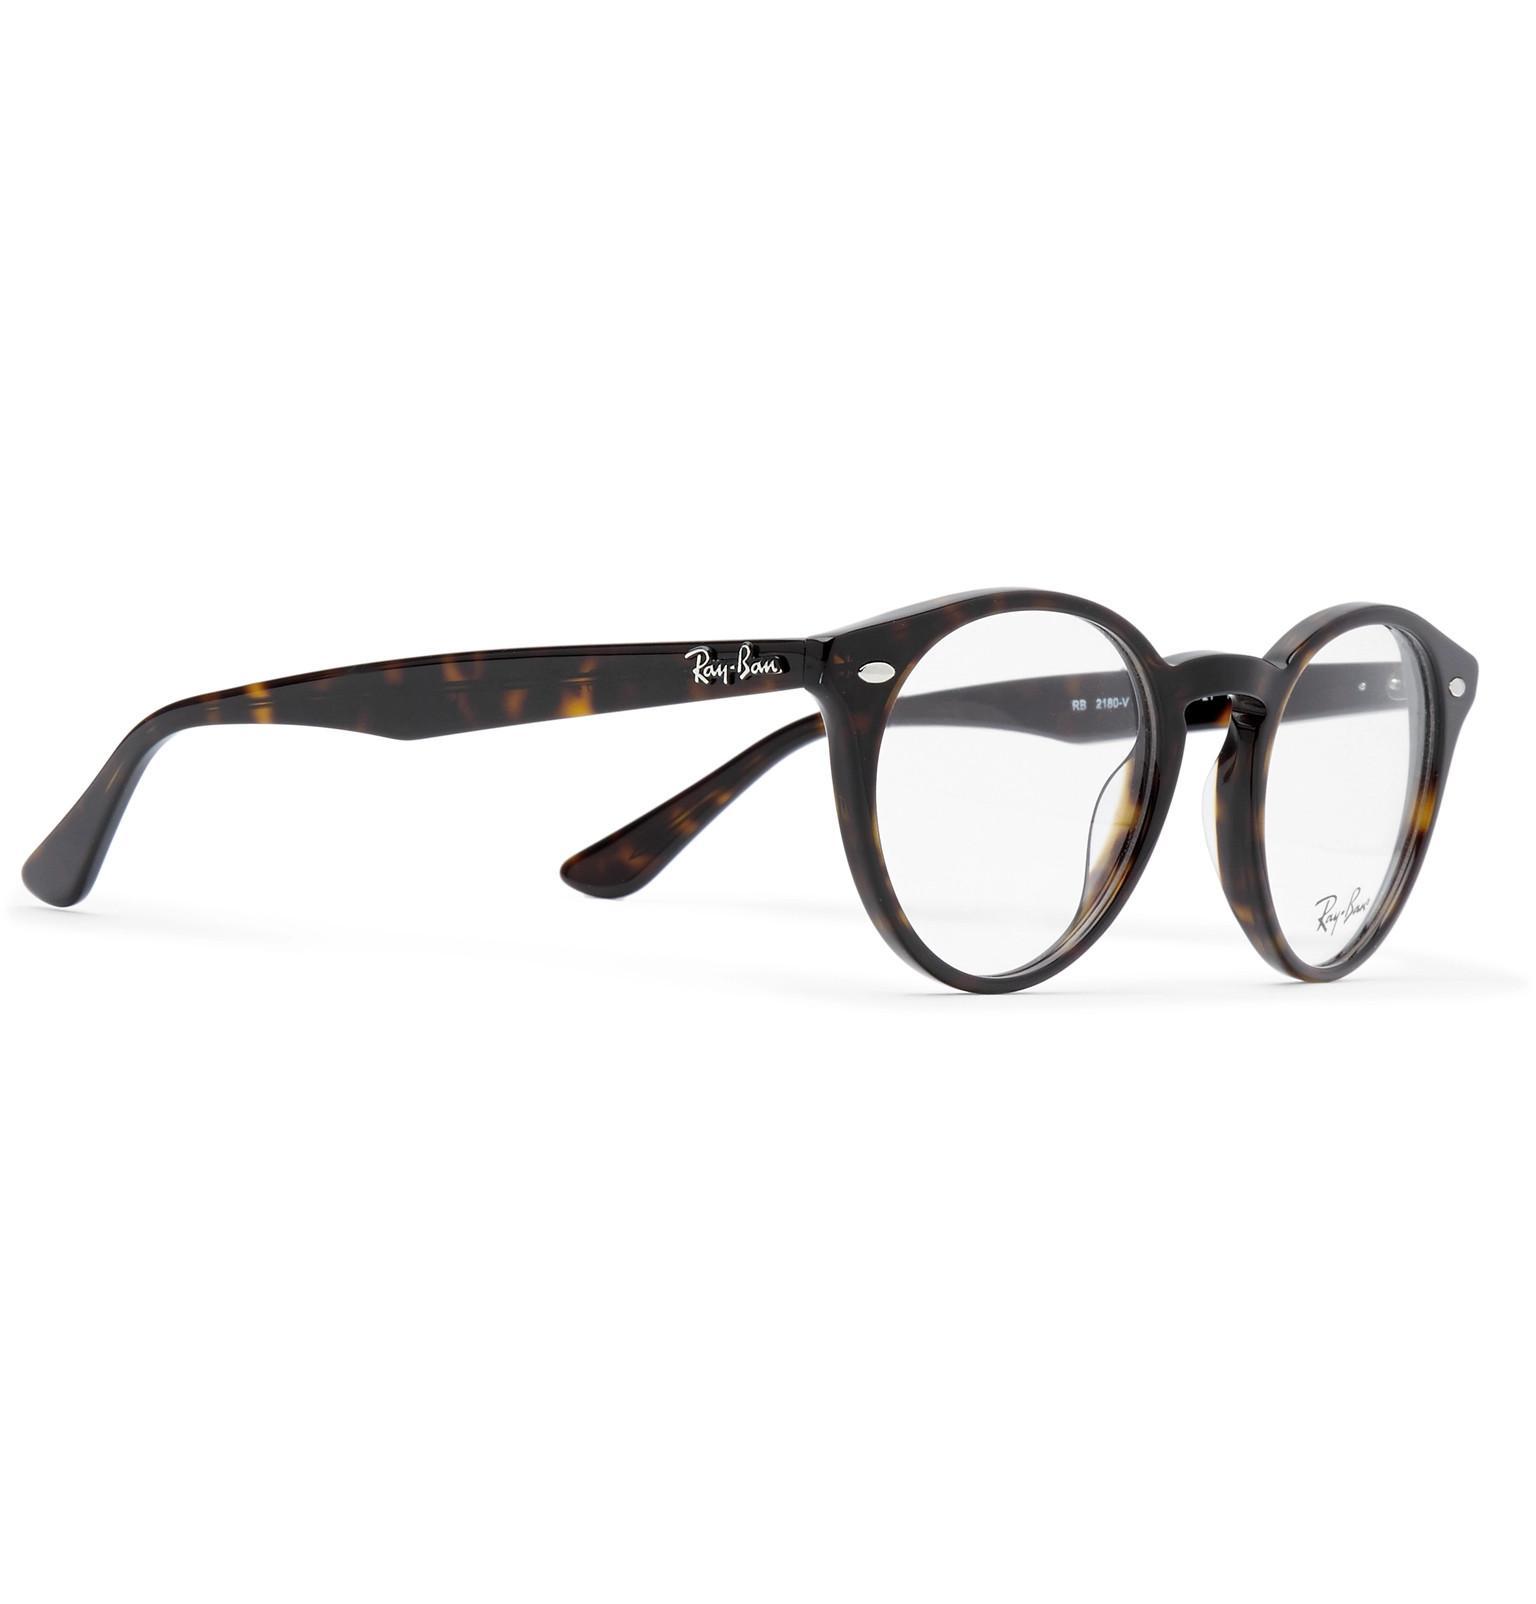 b8cee5cf9a Ray-Ban - Multicolor Round-frame Tortoiseshell Acetate Optical Glasses for  Men - Lyst. View fullscreen